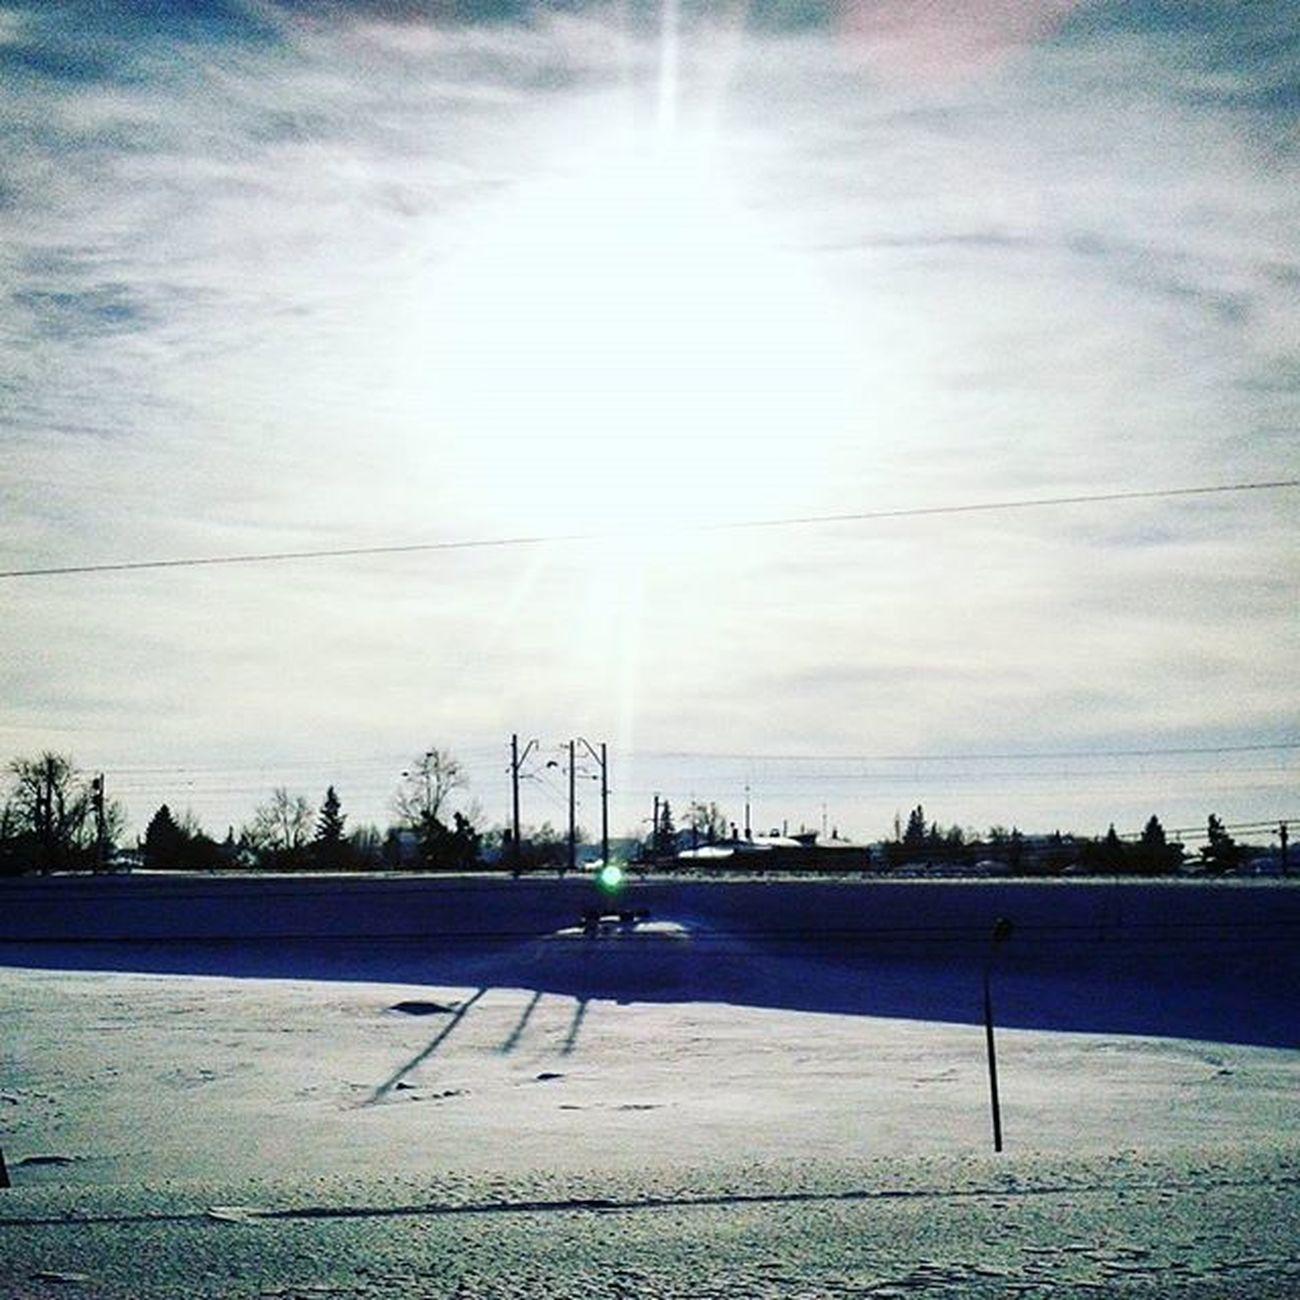 Omsk Siberia Railway Winter Frostandsun January омск сибирь Морозисолнце январь зима железнаядорога